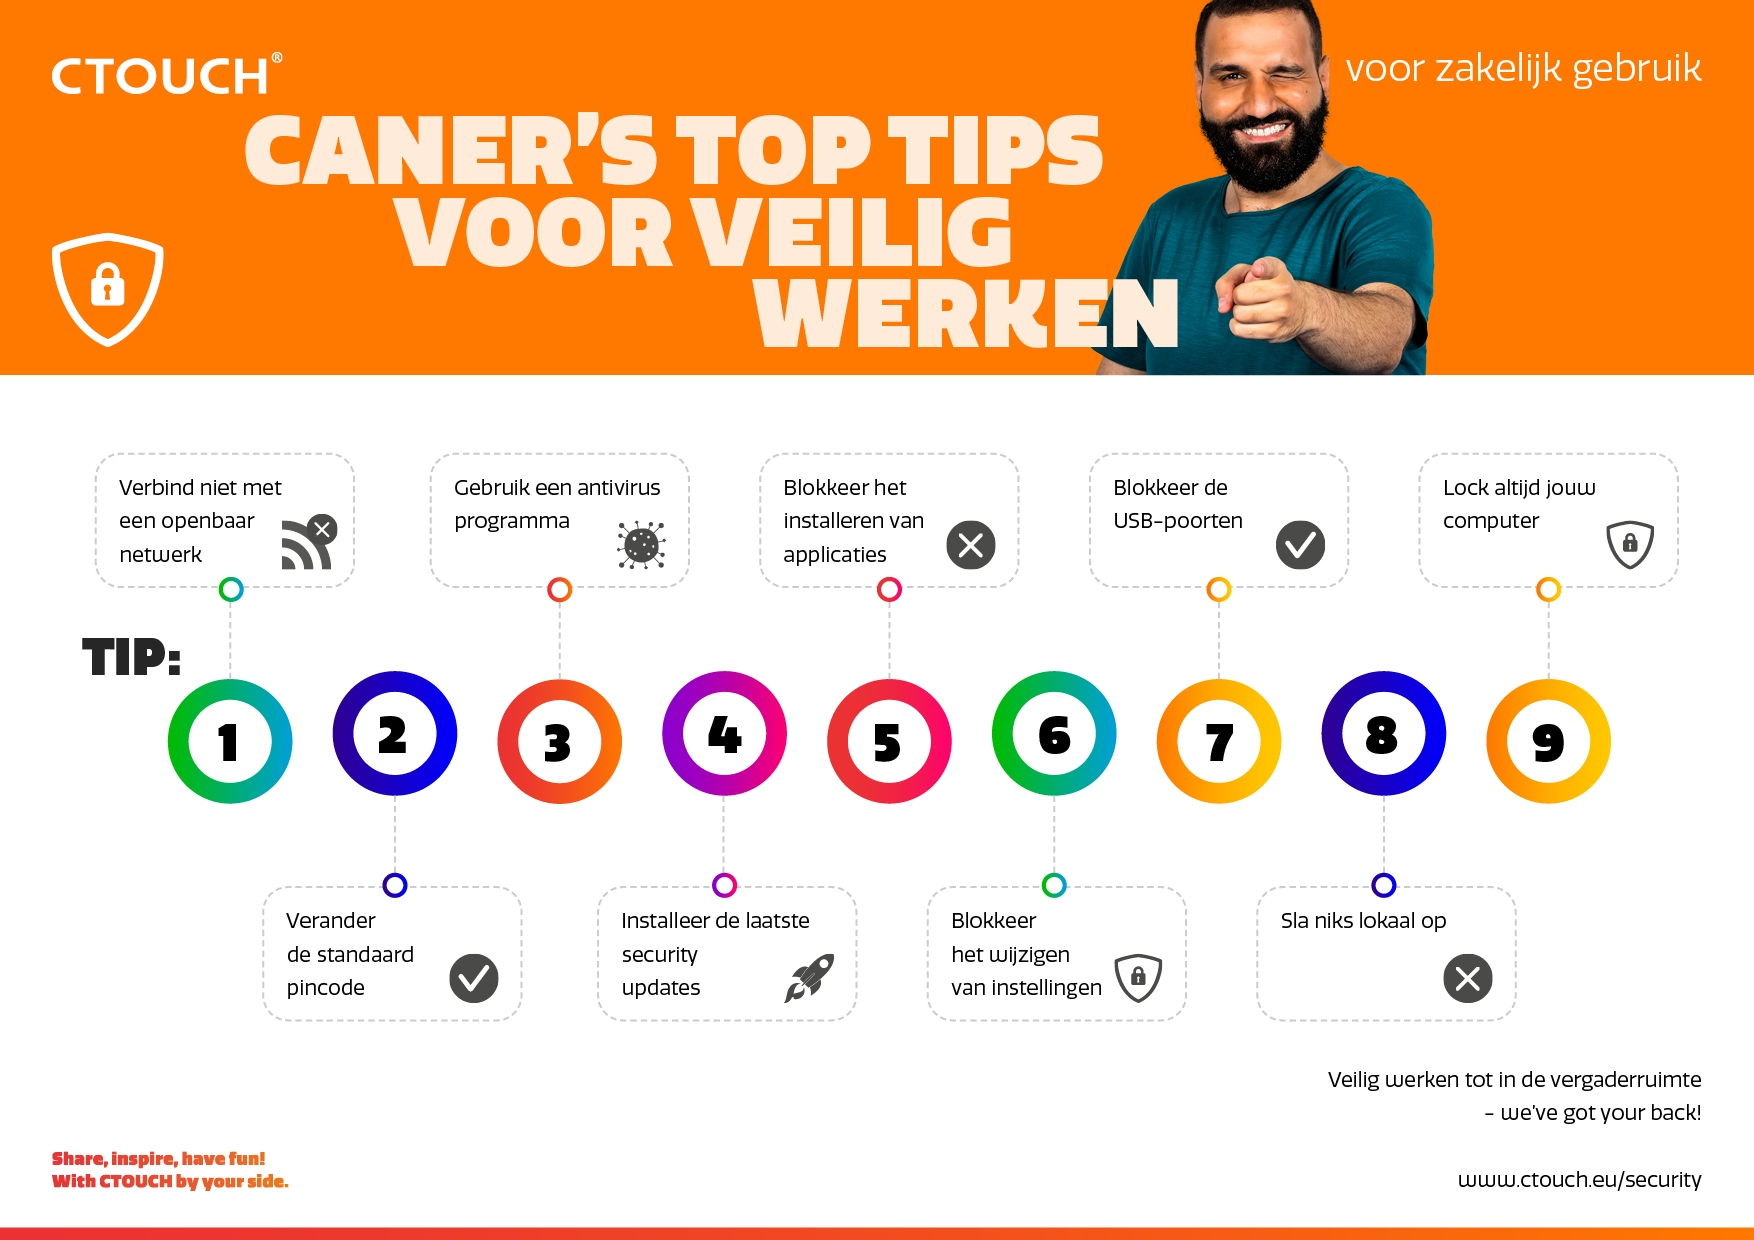 Caner's tips